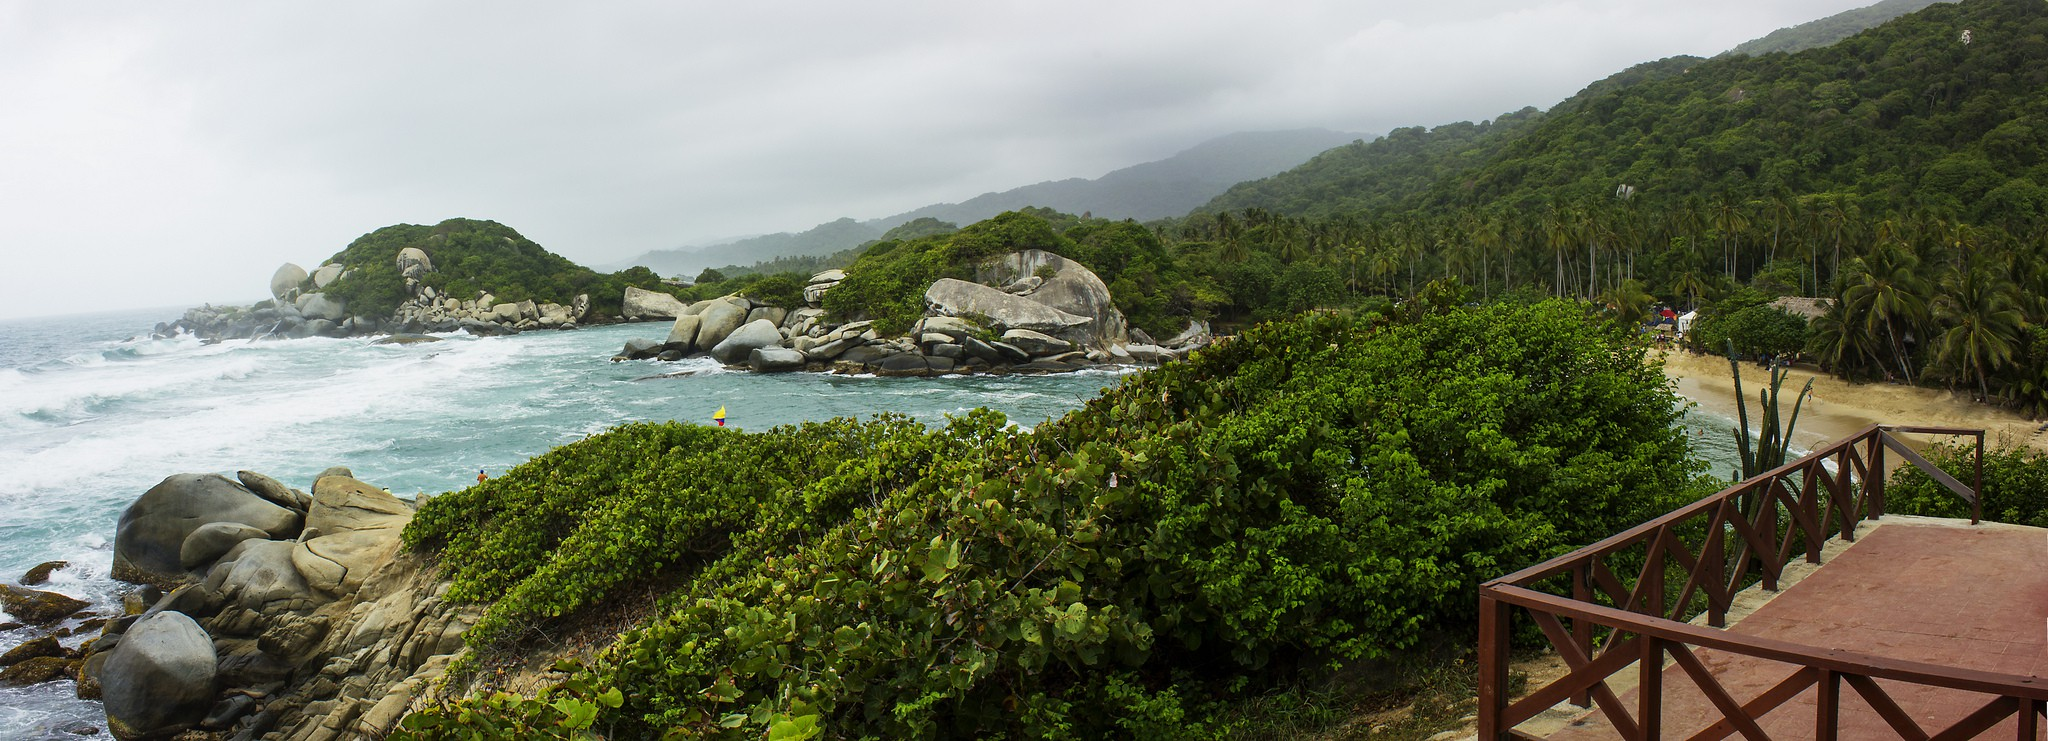 Colombia's Tayrona National Park   © Carlos Andres Reyes/Flickr